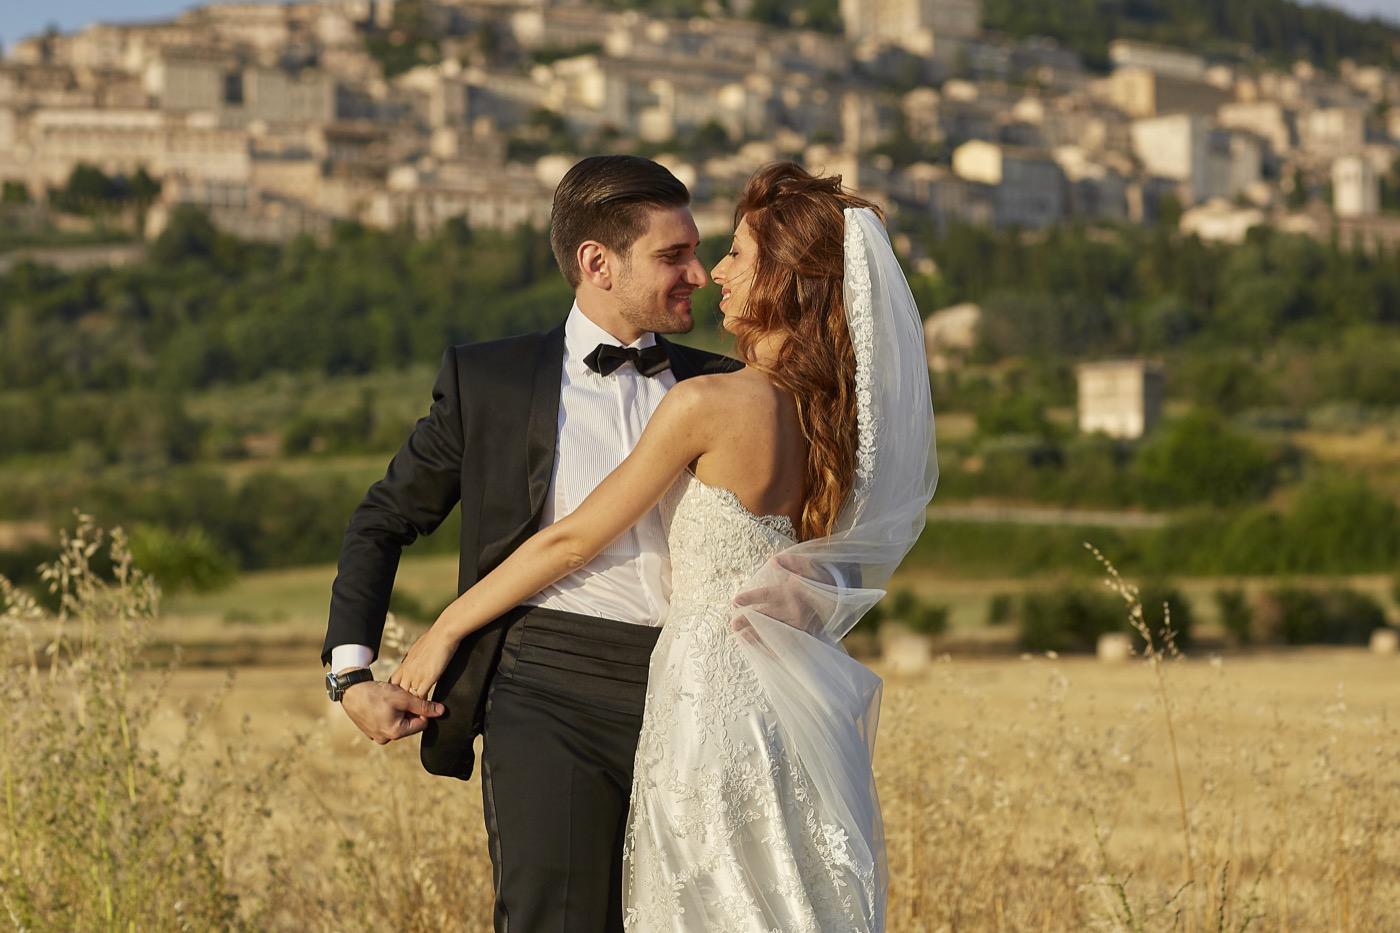 Claudio-Coppola-wedding-photographer-abbazia-7-frati-piegaro-68